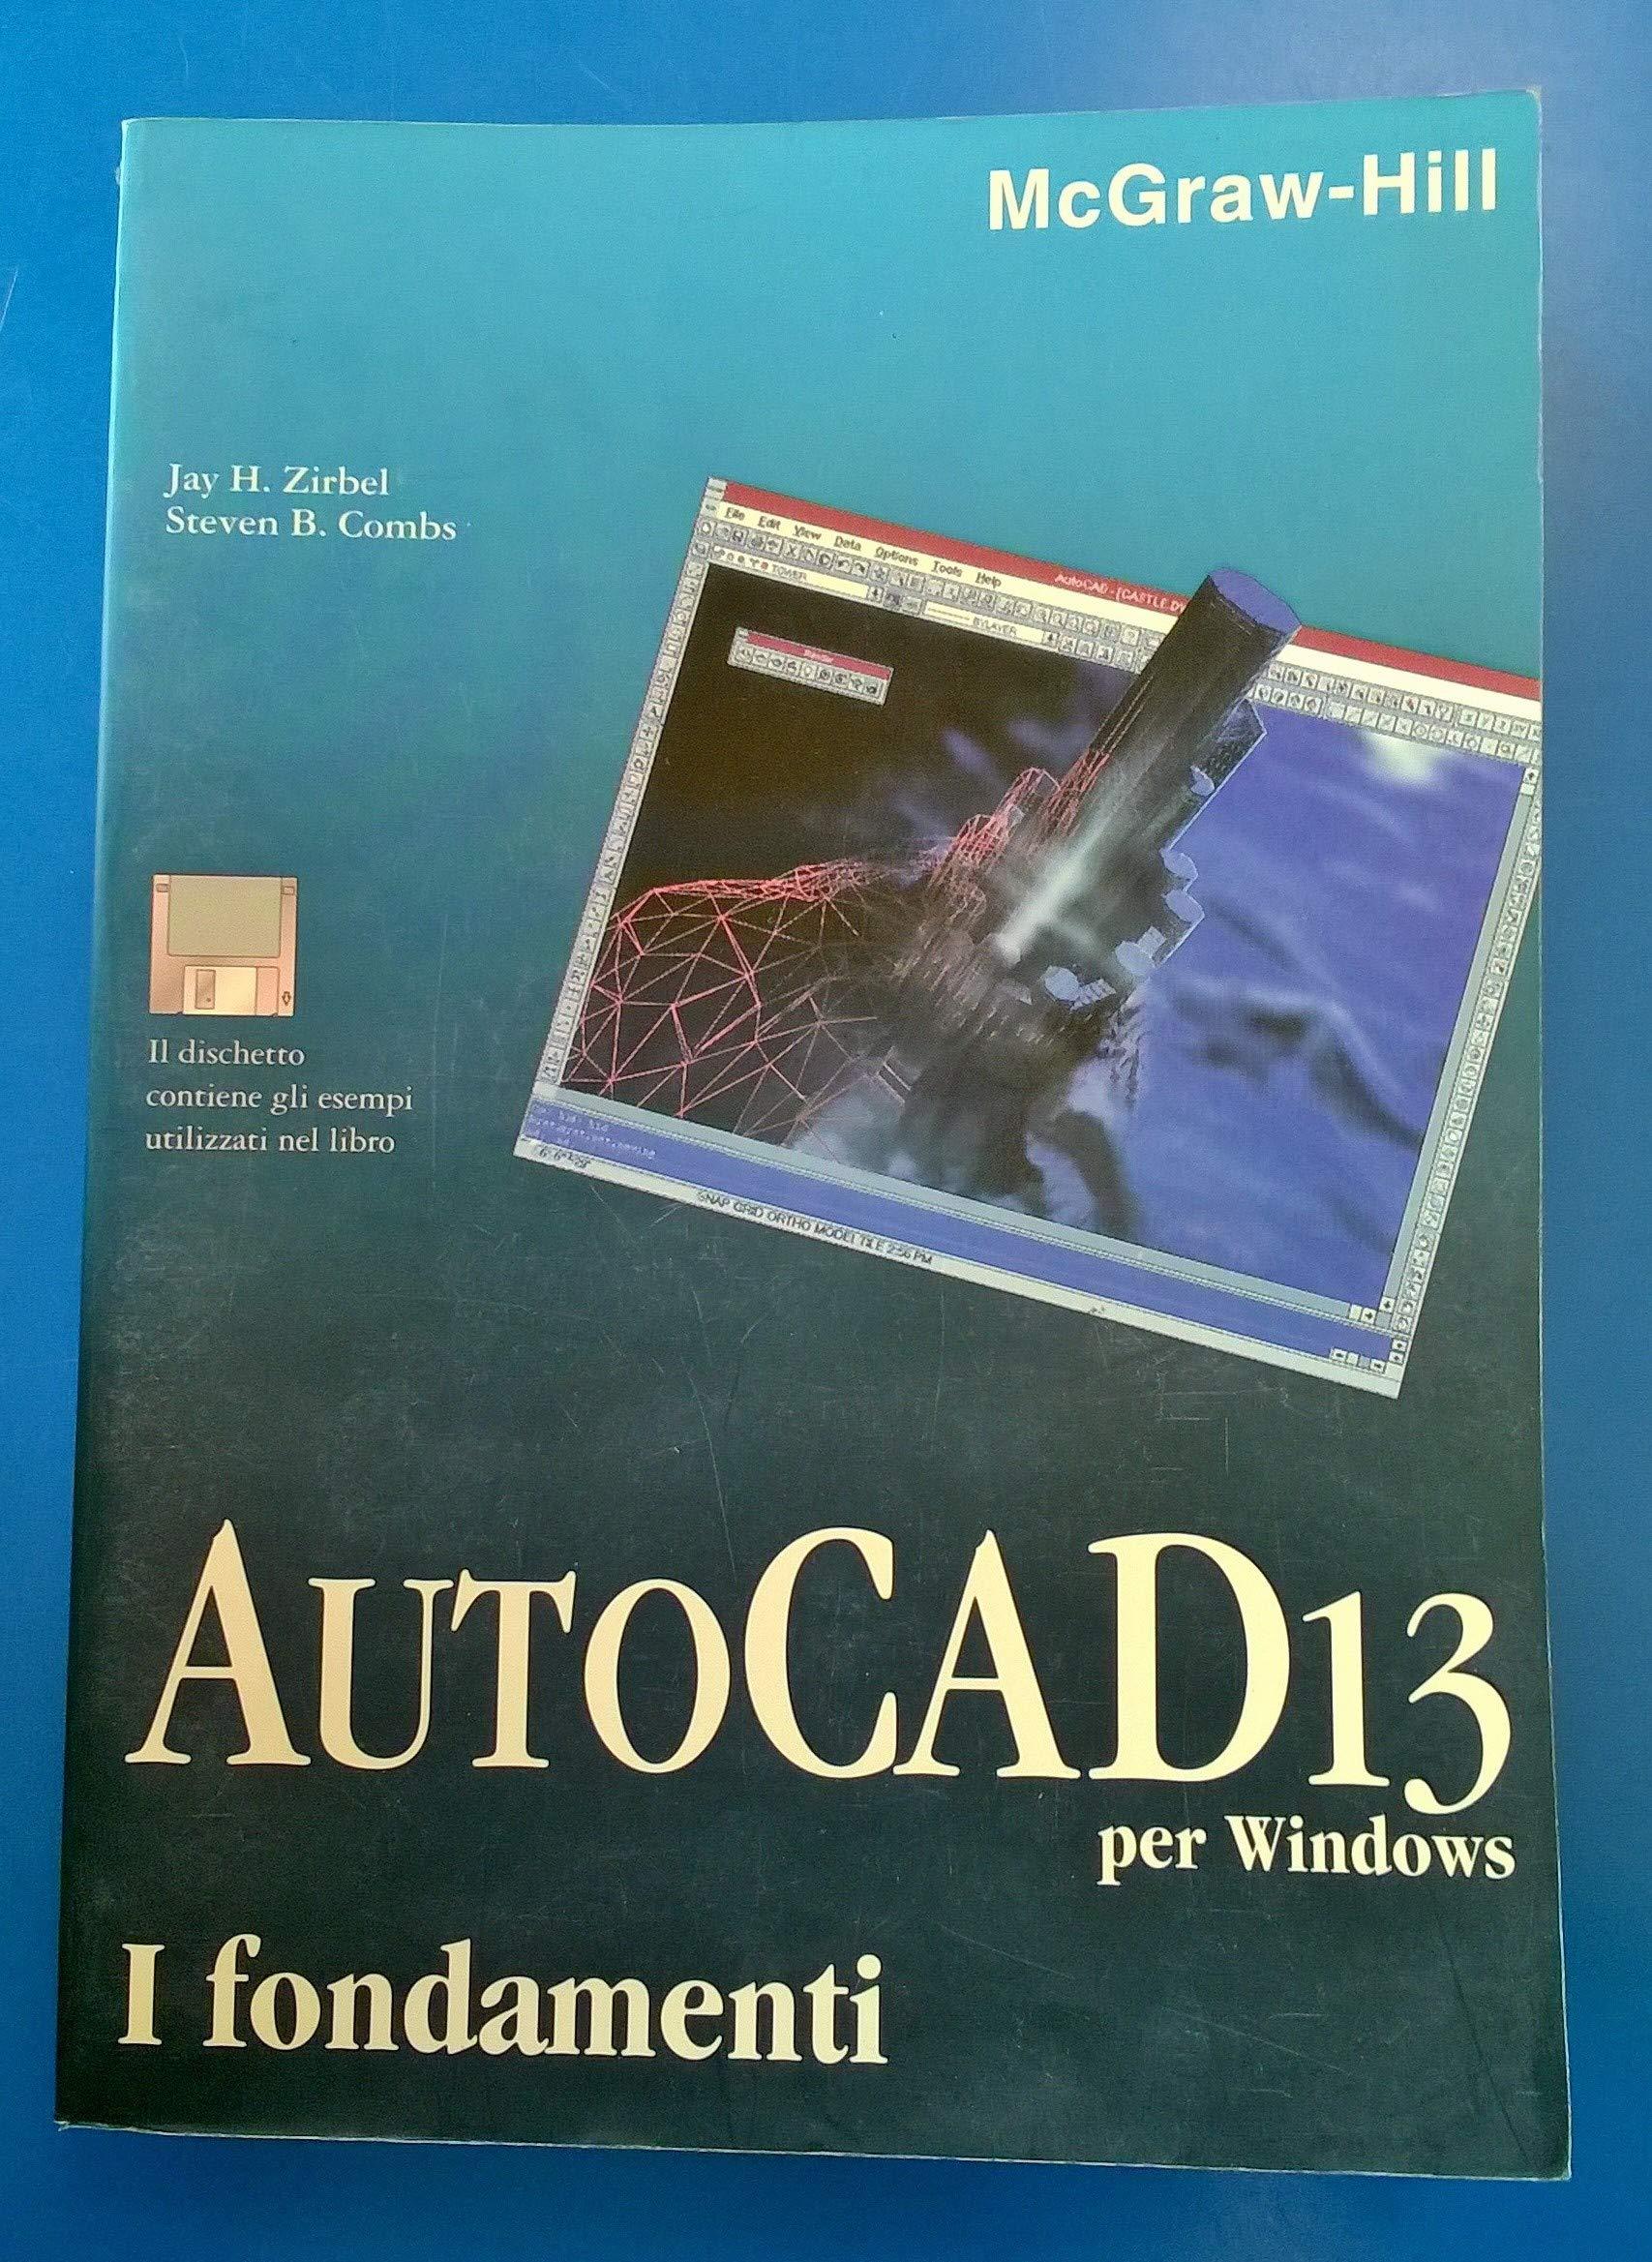 Autocad 13 per Windows. I fondamenti (Informatica): Amazon.es: Zirbel, Jay H., Combs, Steven B., Michelini, A.: Libros en idiomas extranjeros